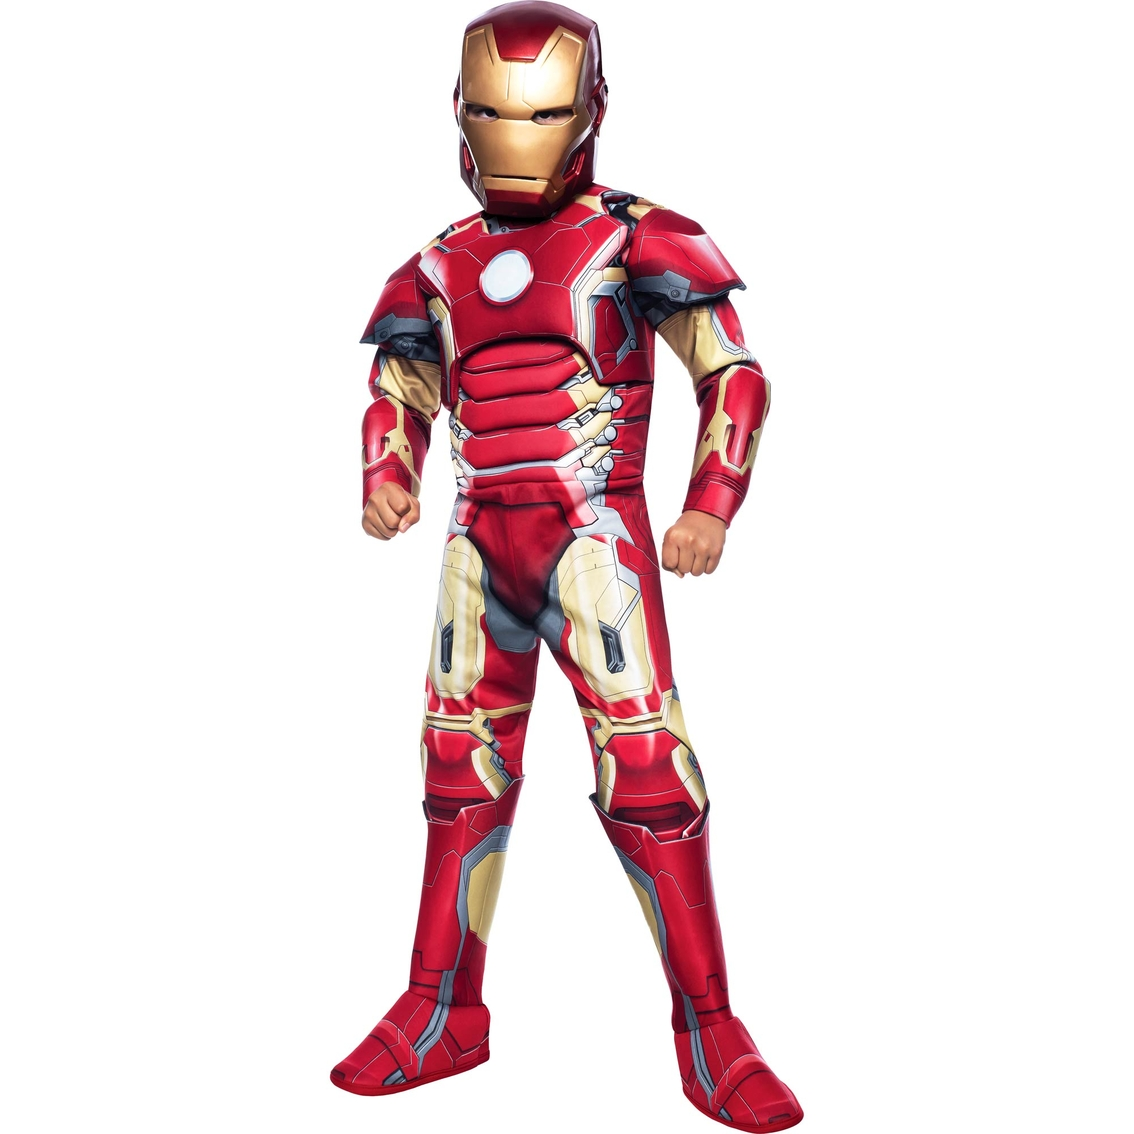 Rubie S Costume Co Boys Deluxe Iron Man Movie Costume Costumes